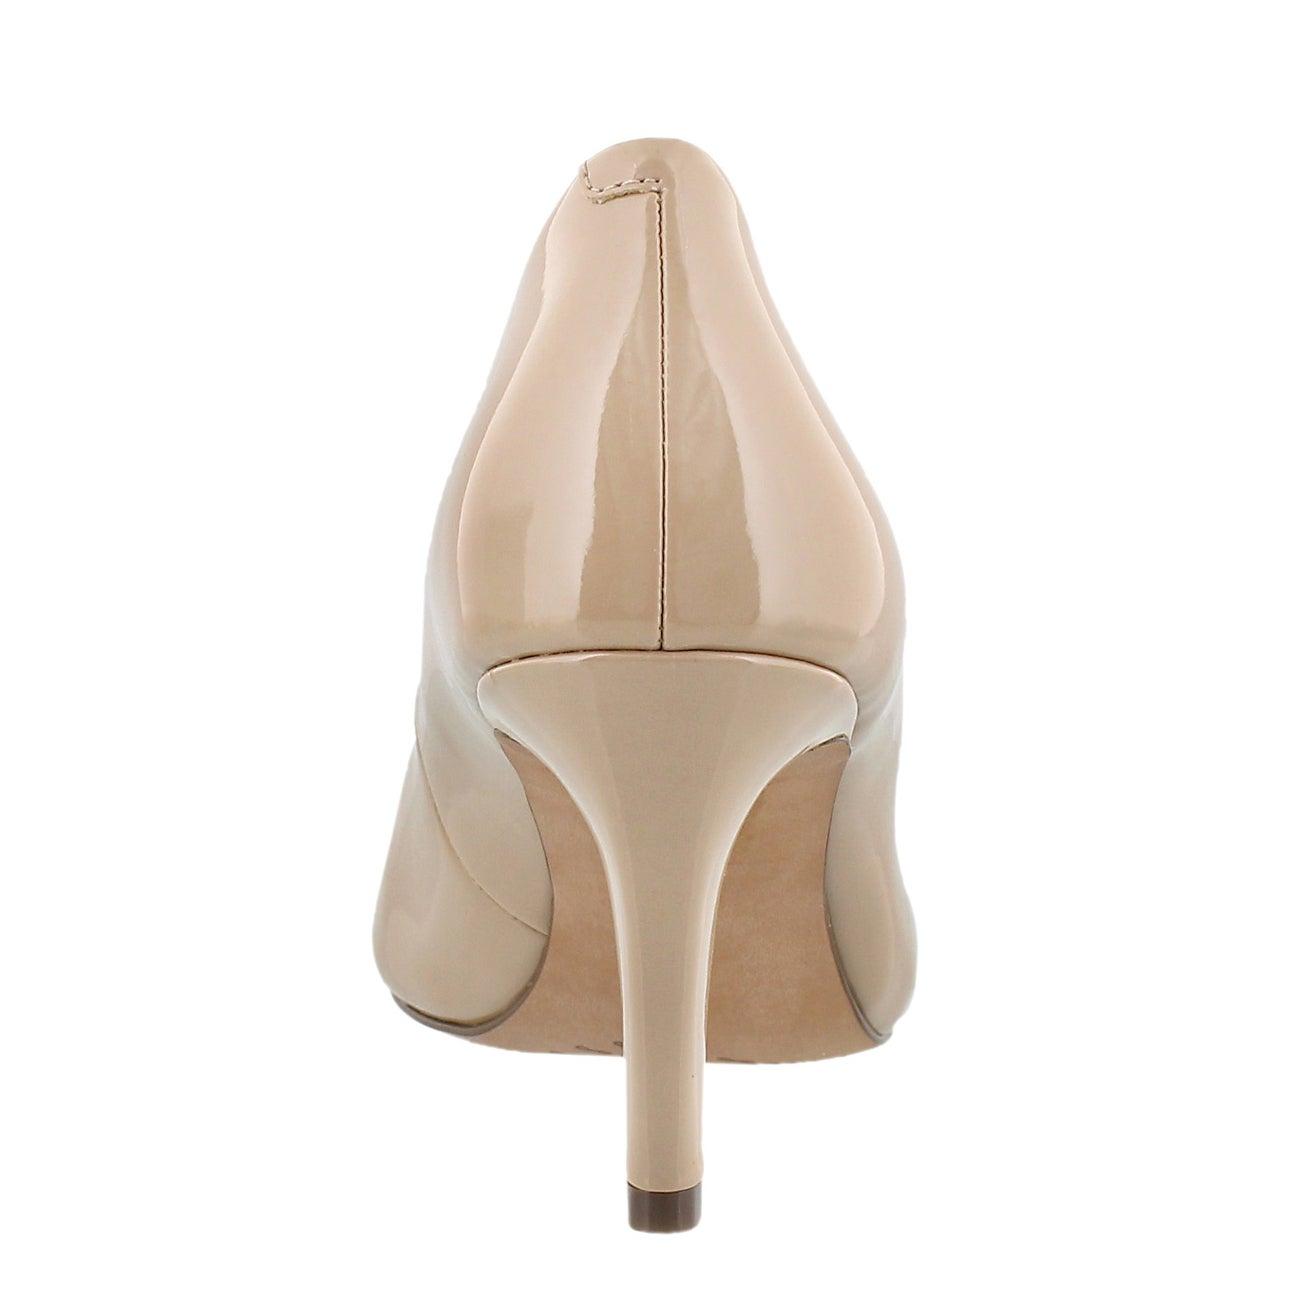 Lds Carlita Cove sand patent dress pump